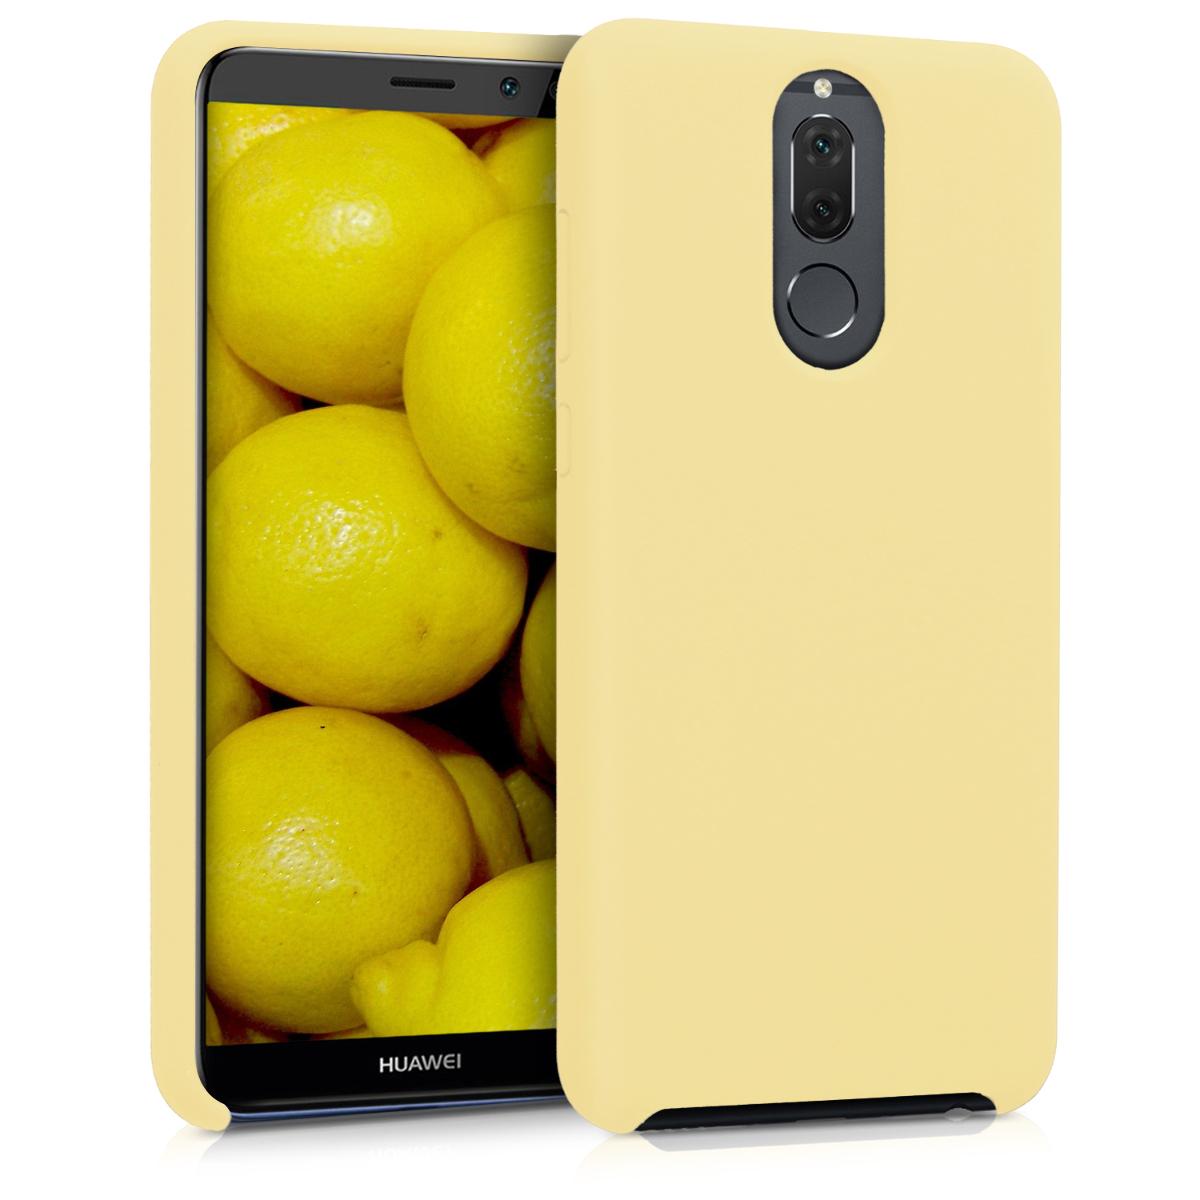 KW Θήκη Σιλικόνης Huawei Mate 10 Lite - Soft Flexible Rubber - Light Yellow (43768.158)